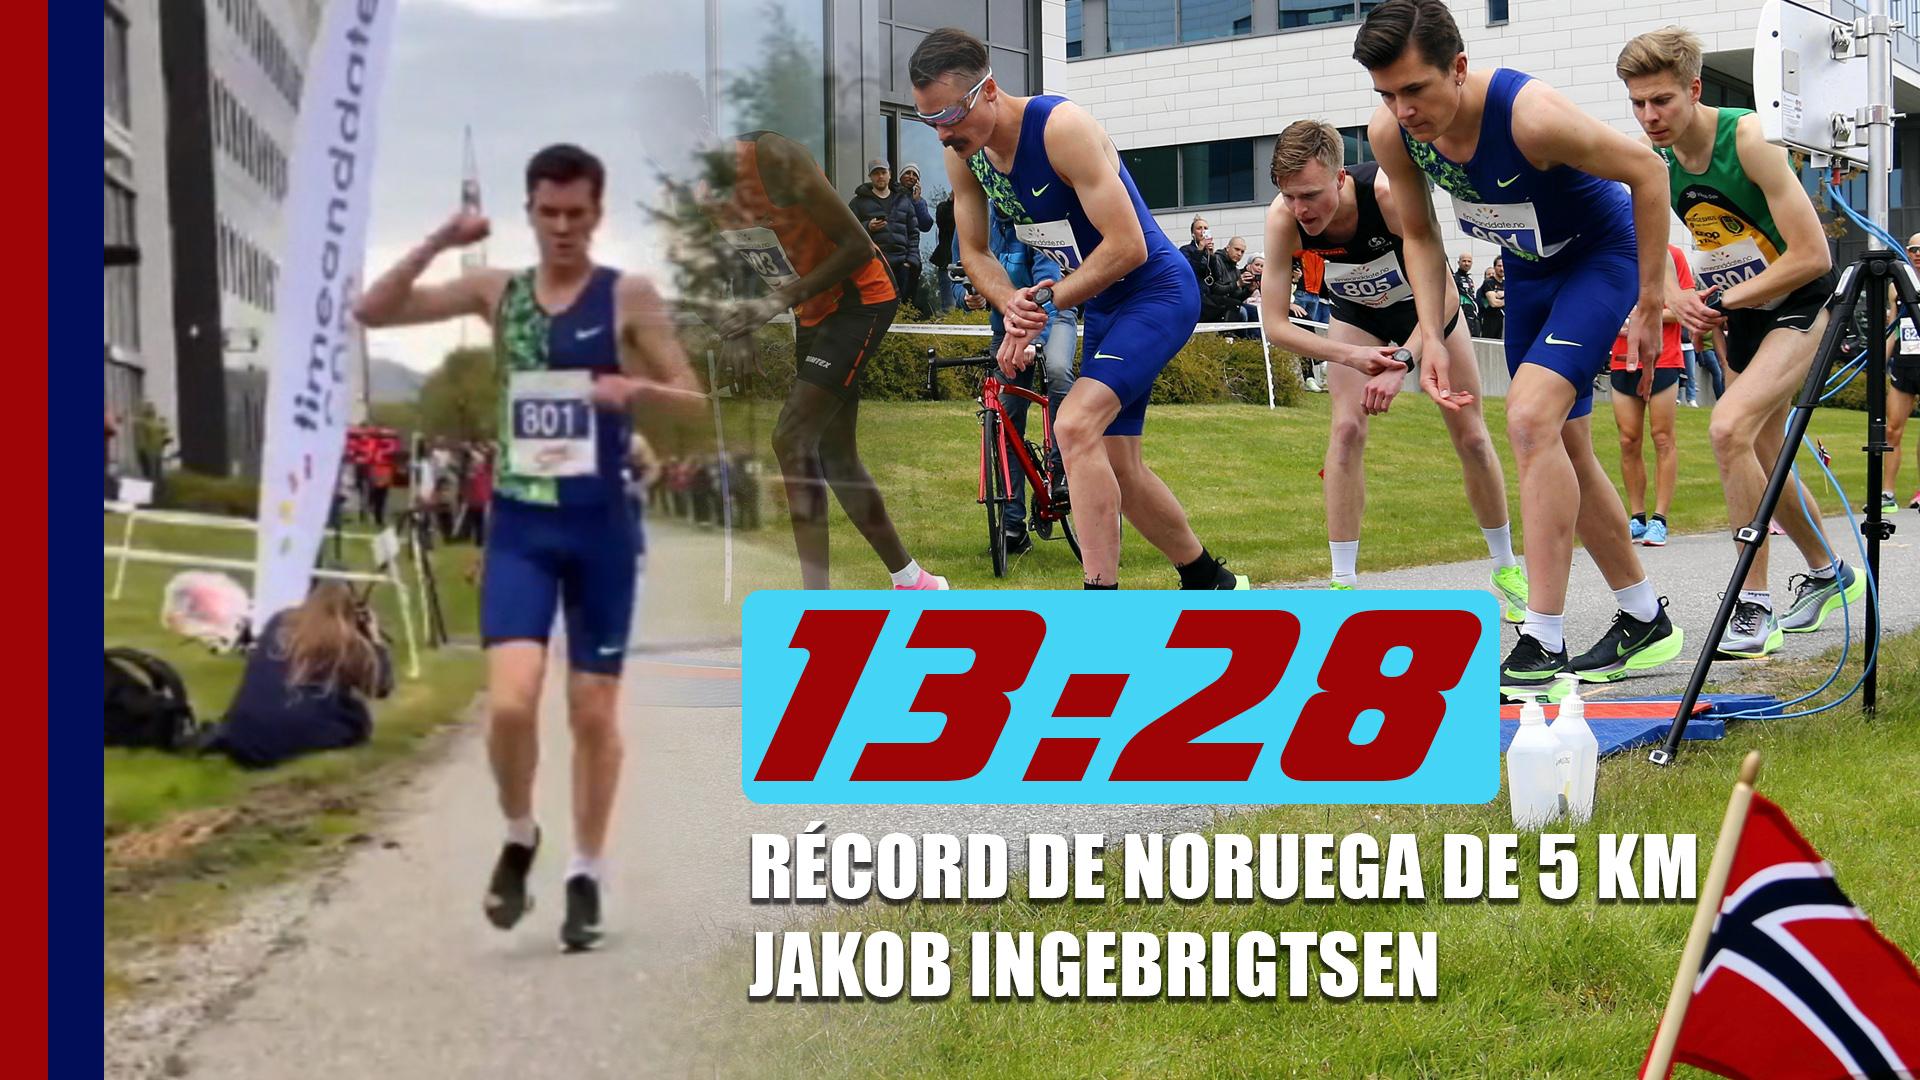 JAKOB INGEBRIGTSEN RECORD 5K STAVANGER